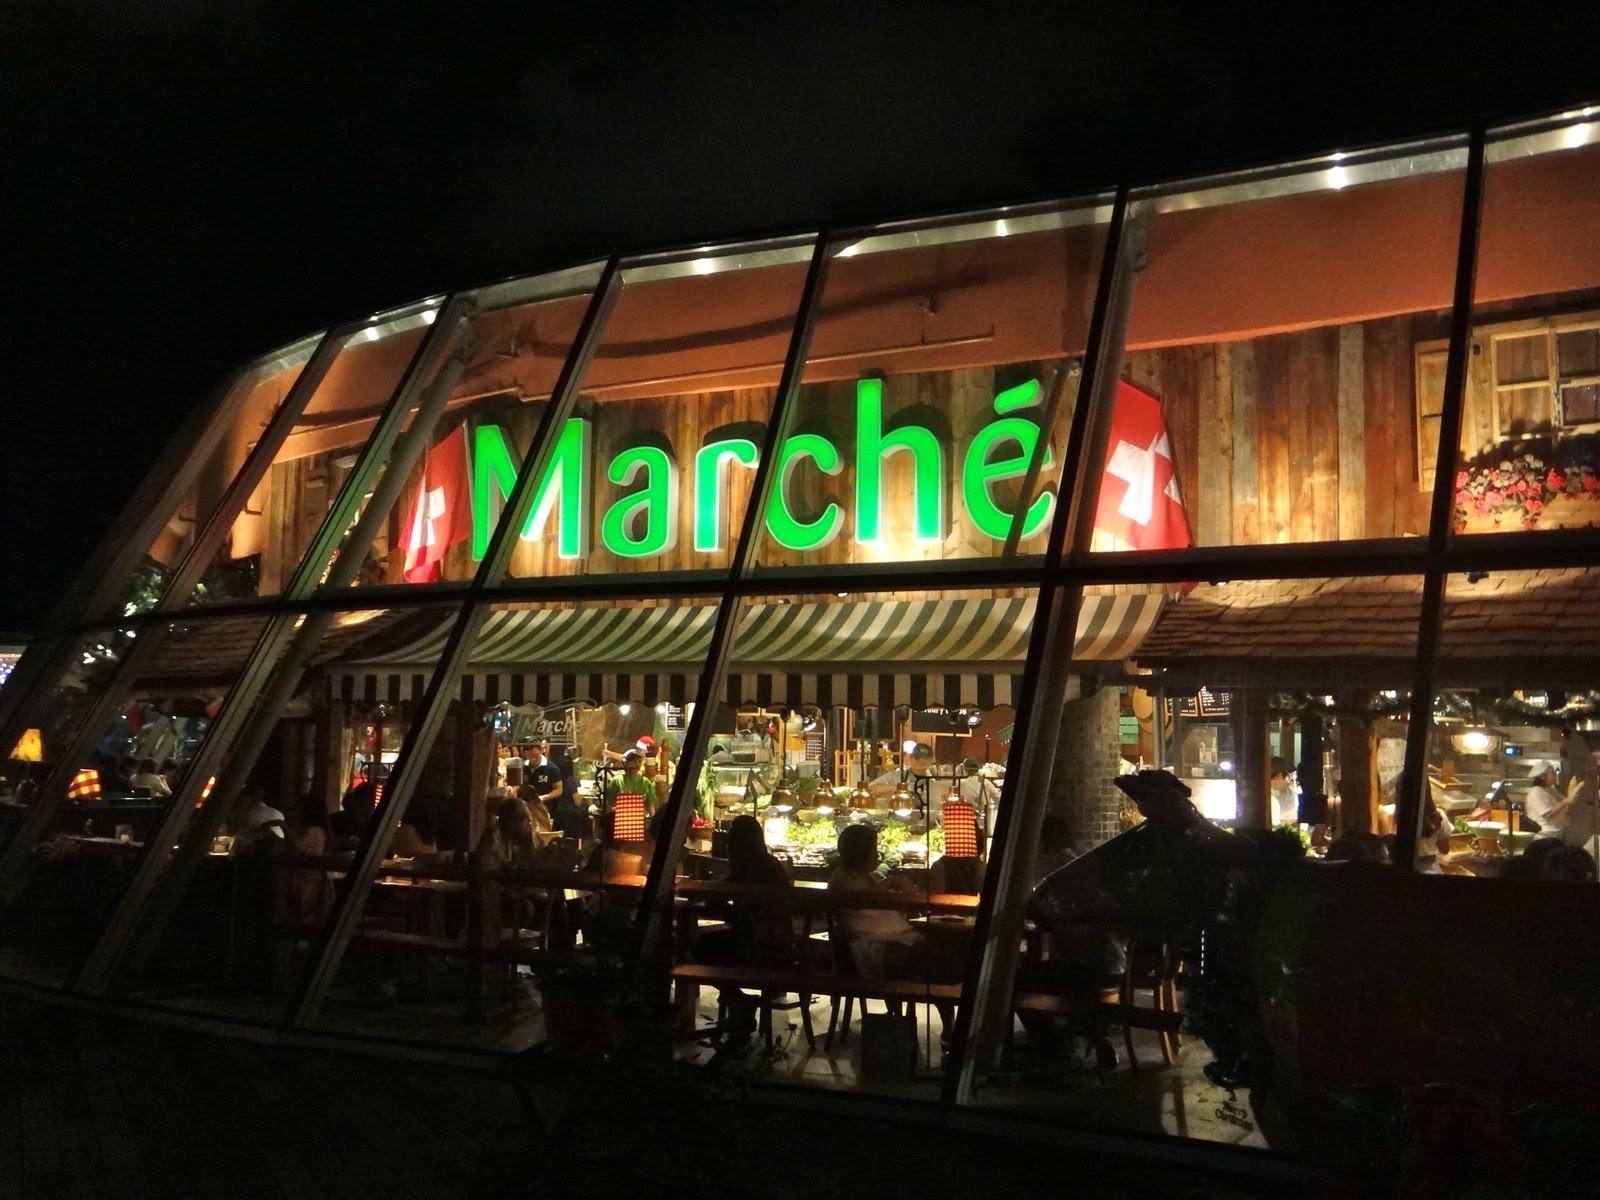 Marche Vivo City | Nice Restaurants in Singapore | Where ...